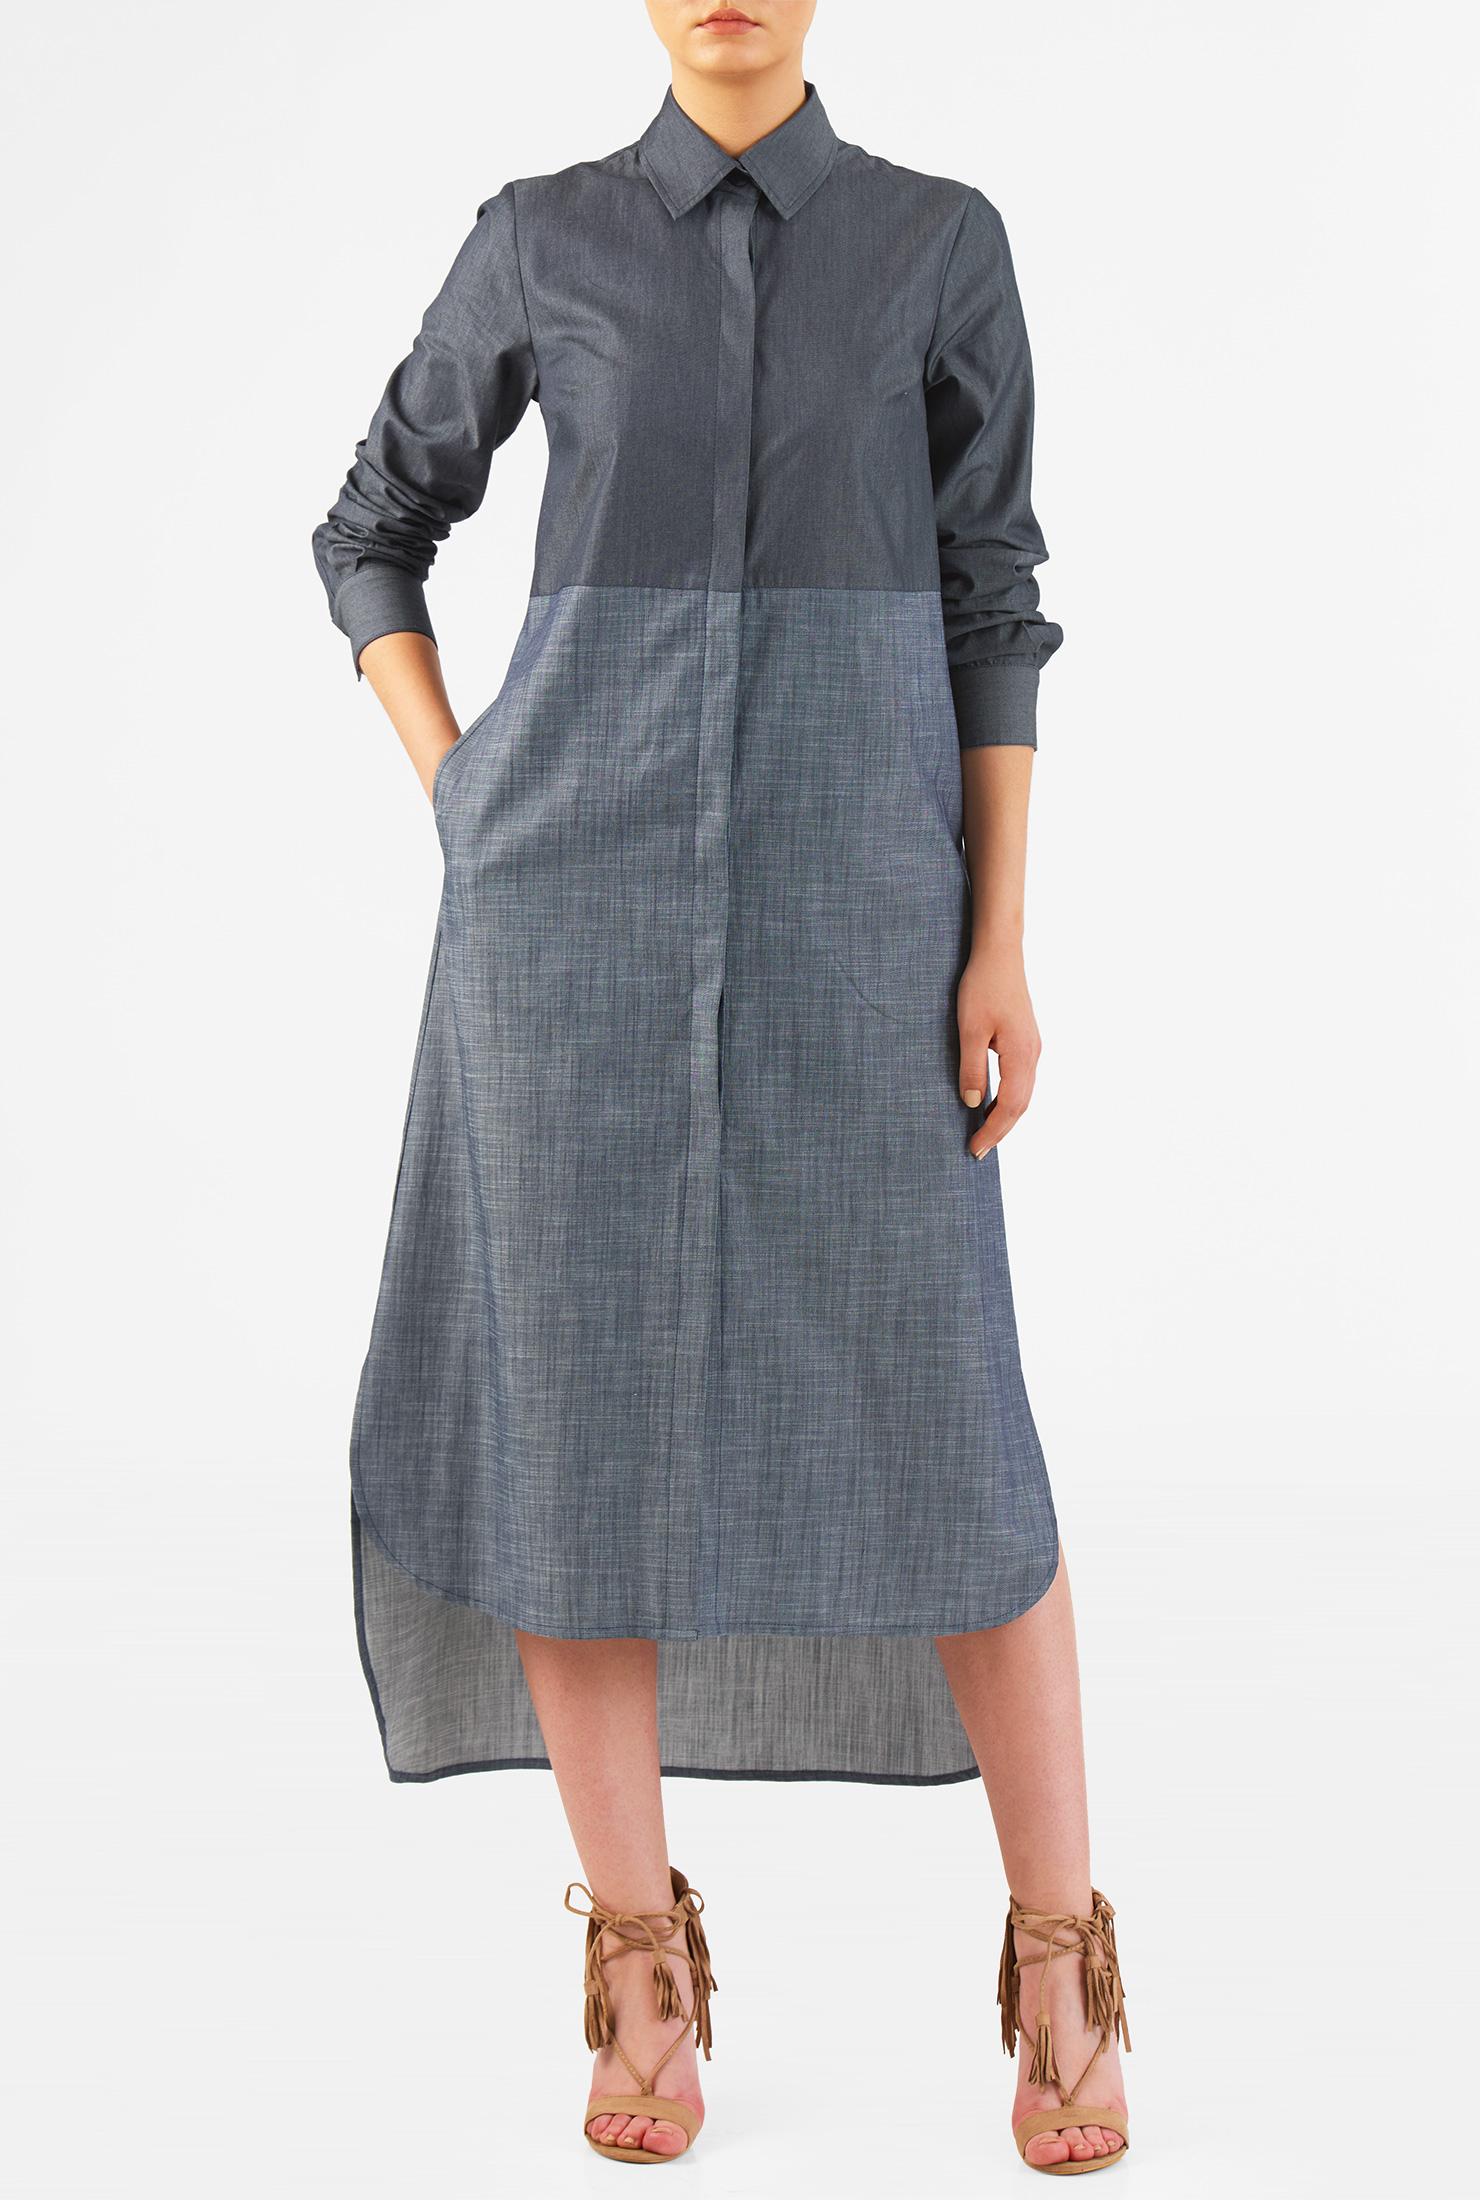 Eshakti Women S Colorblock High Low Hem Cotton Chambray Shirtdress image